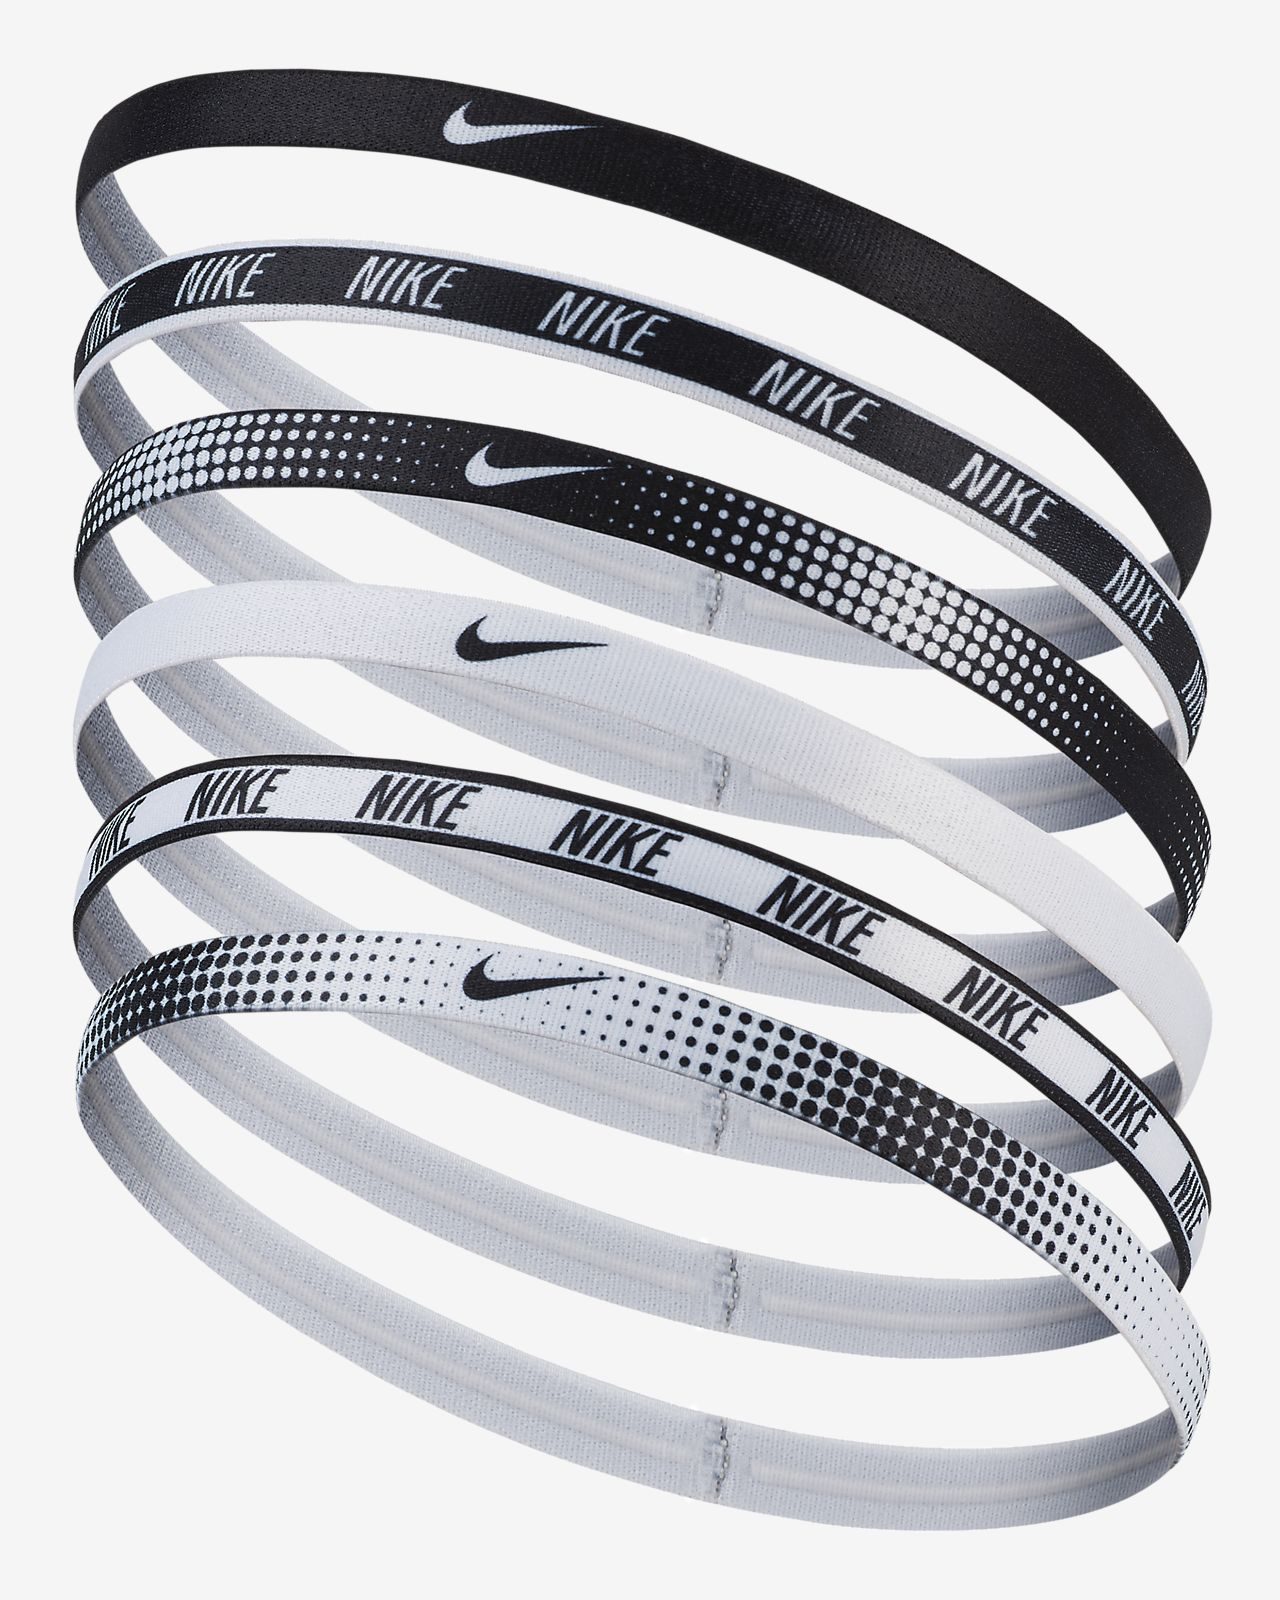 Nike Headbands (6 Pack)